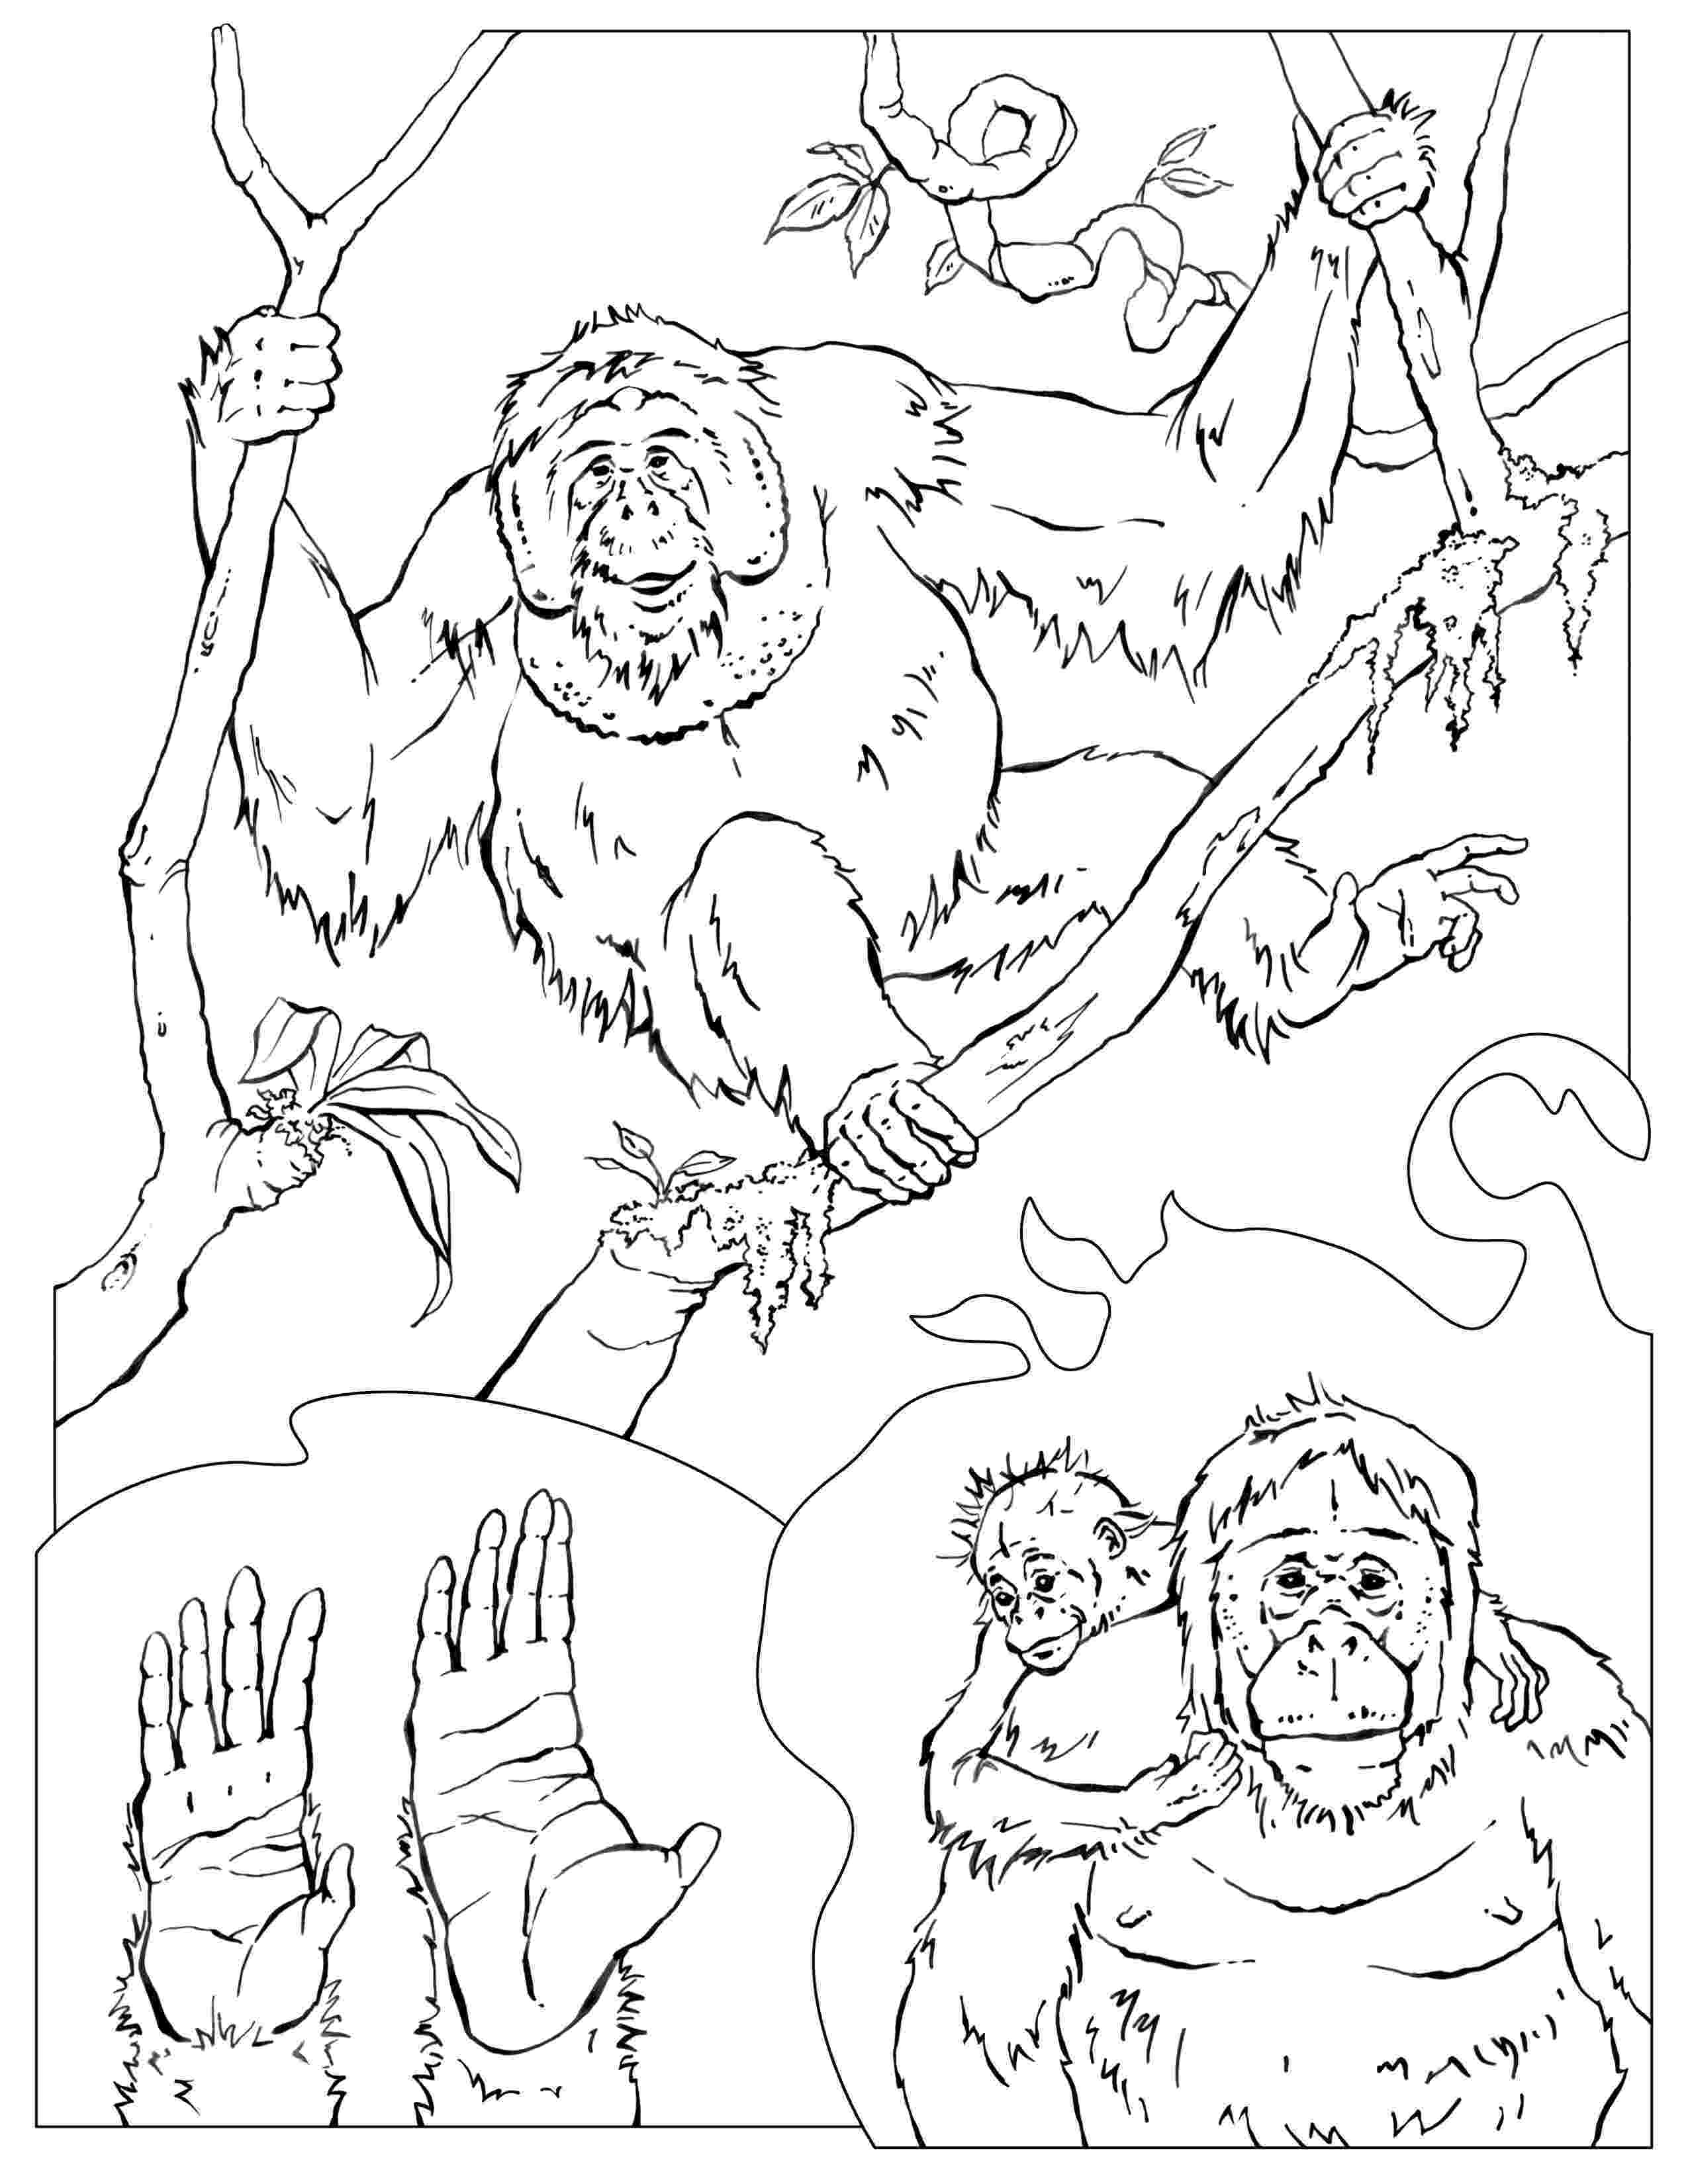 orangutan coloring page orangutan coloring page coloring home coloring orangutan page